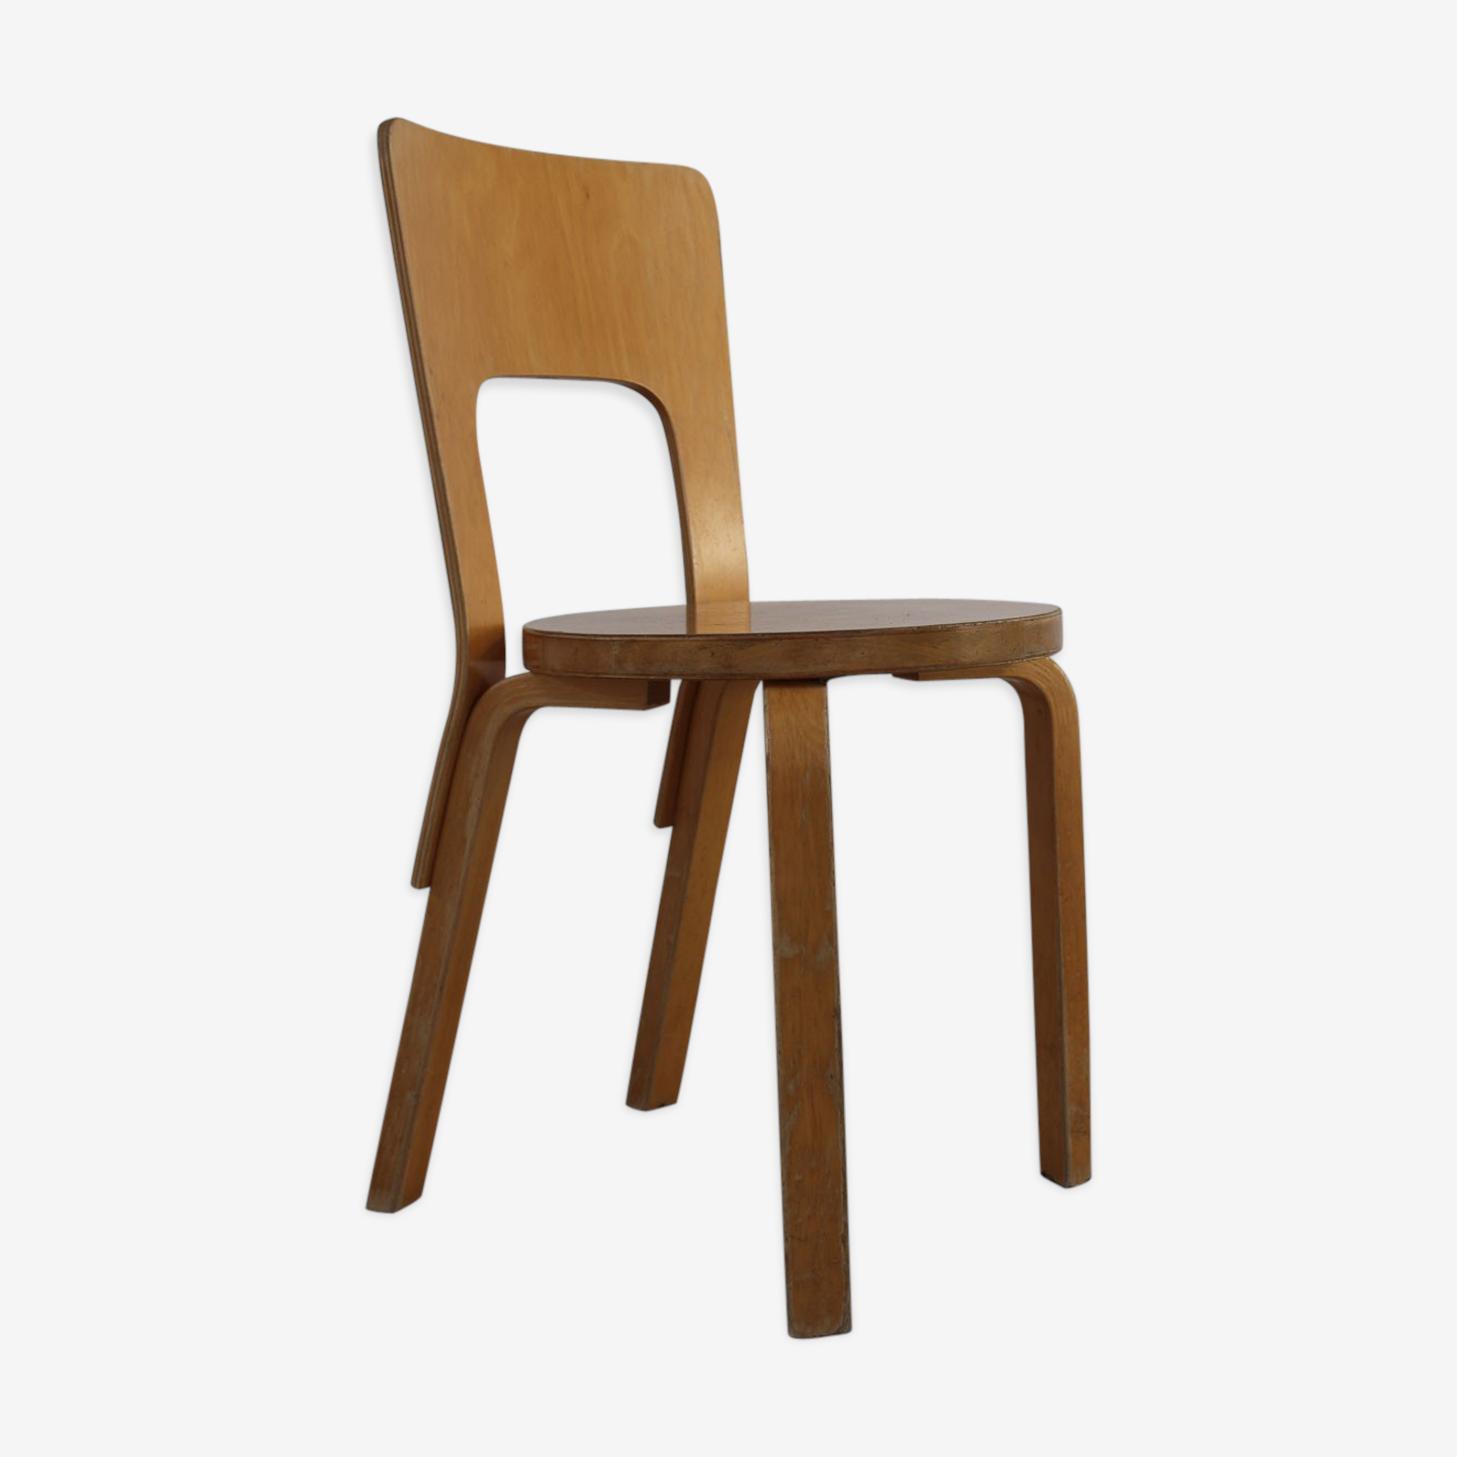 Chaise n°66 Alvar Aalto